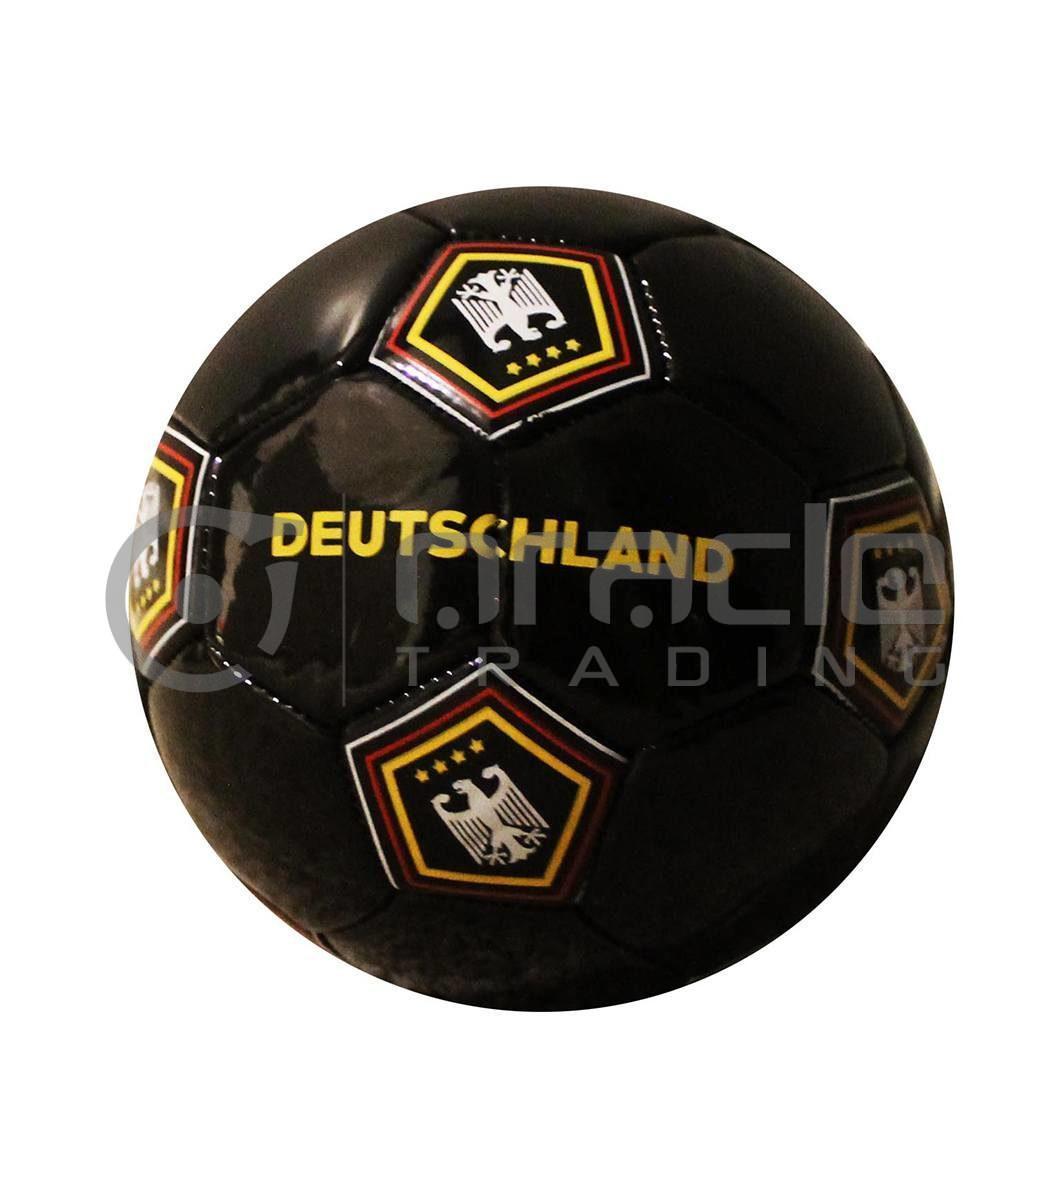 Germany Small Soccer Ball - Black